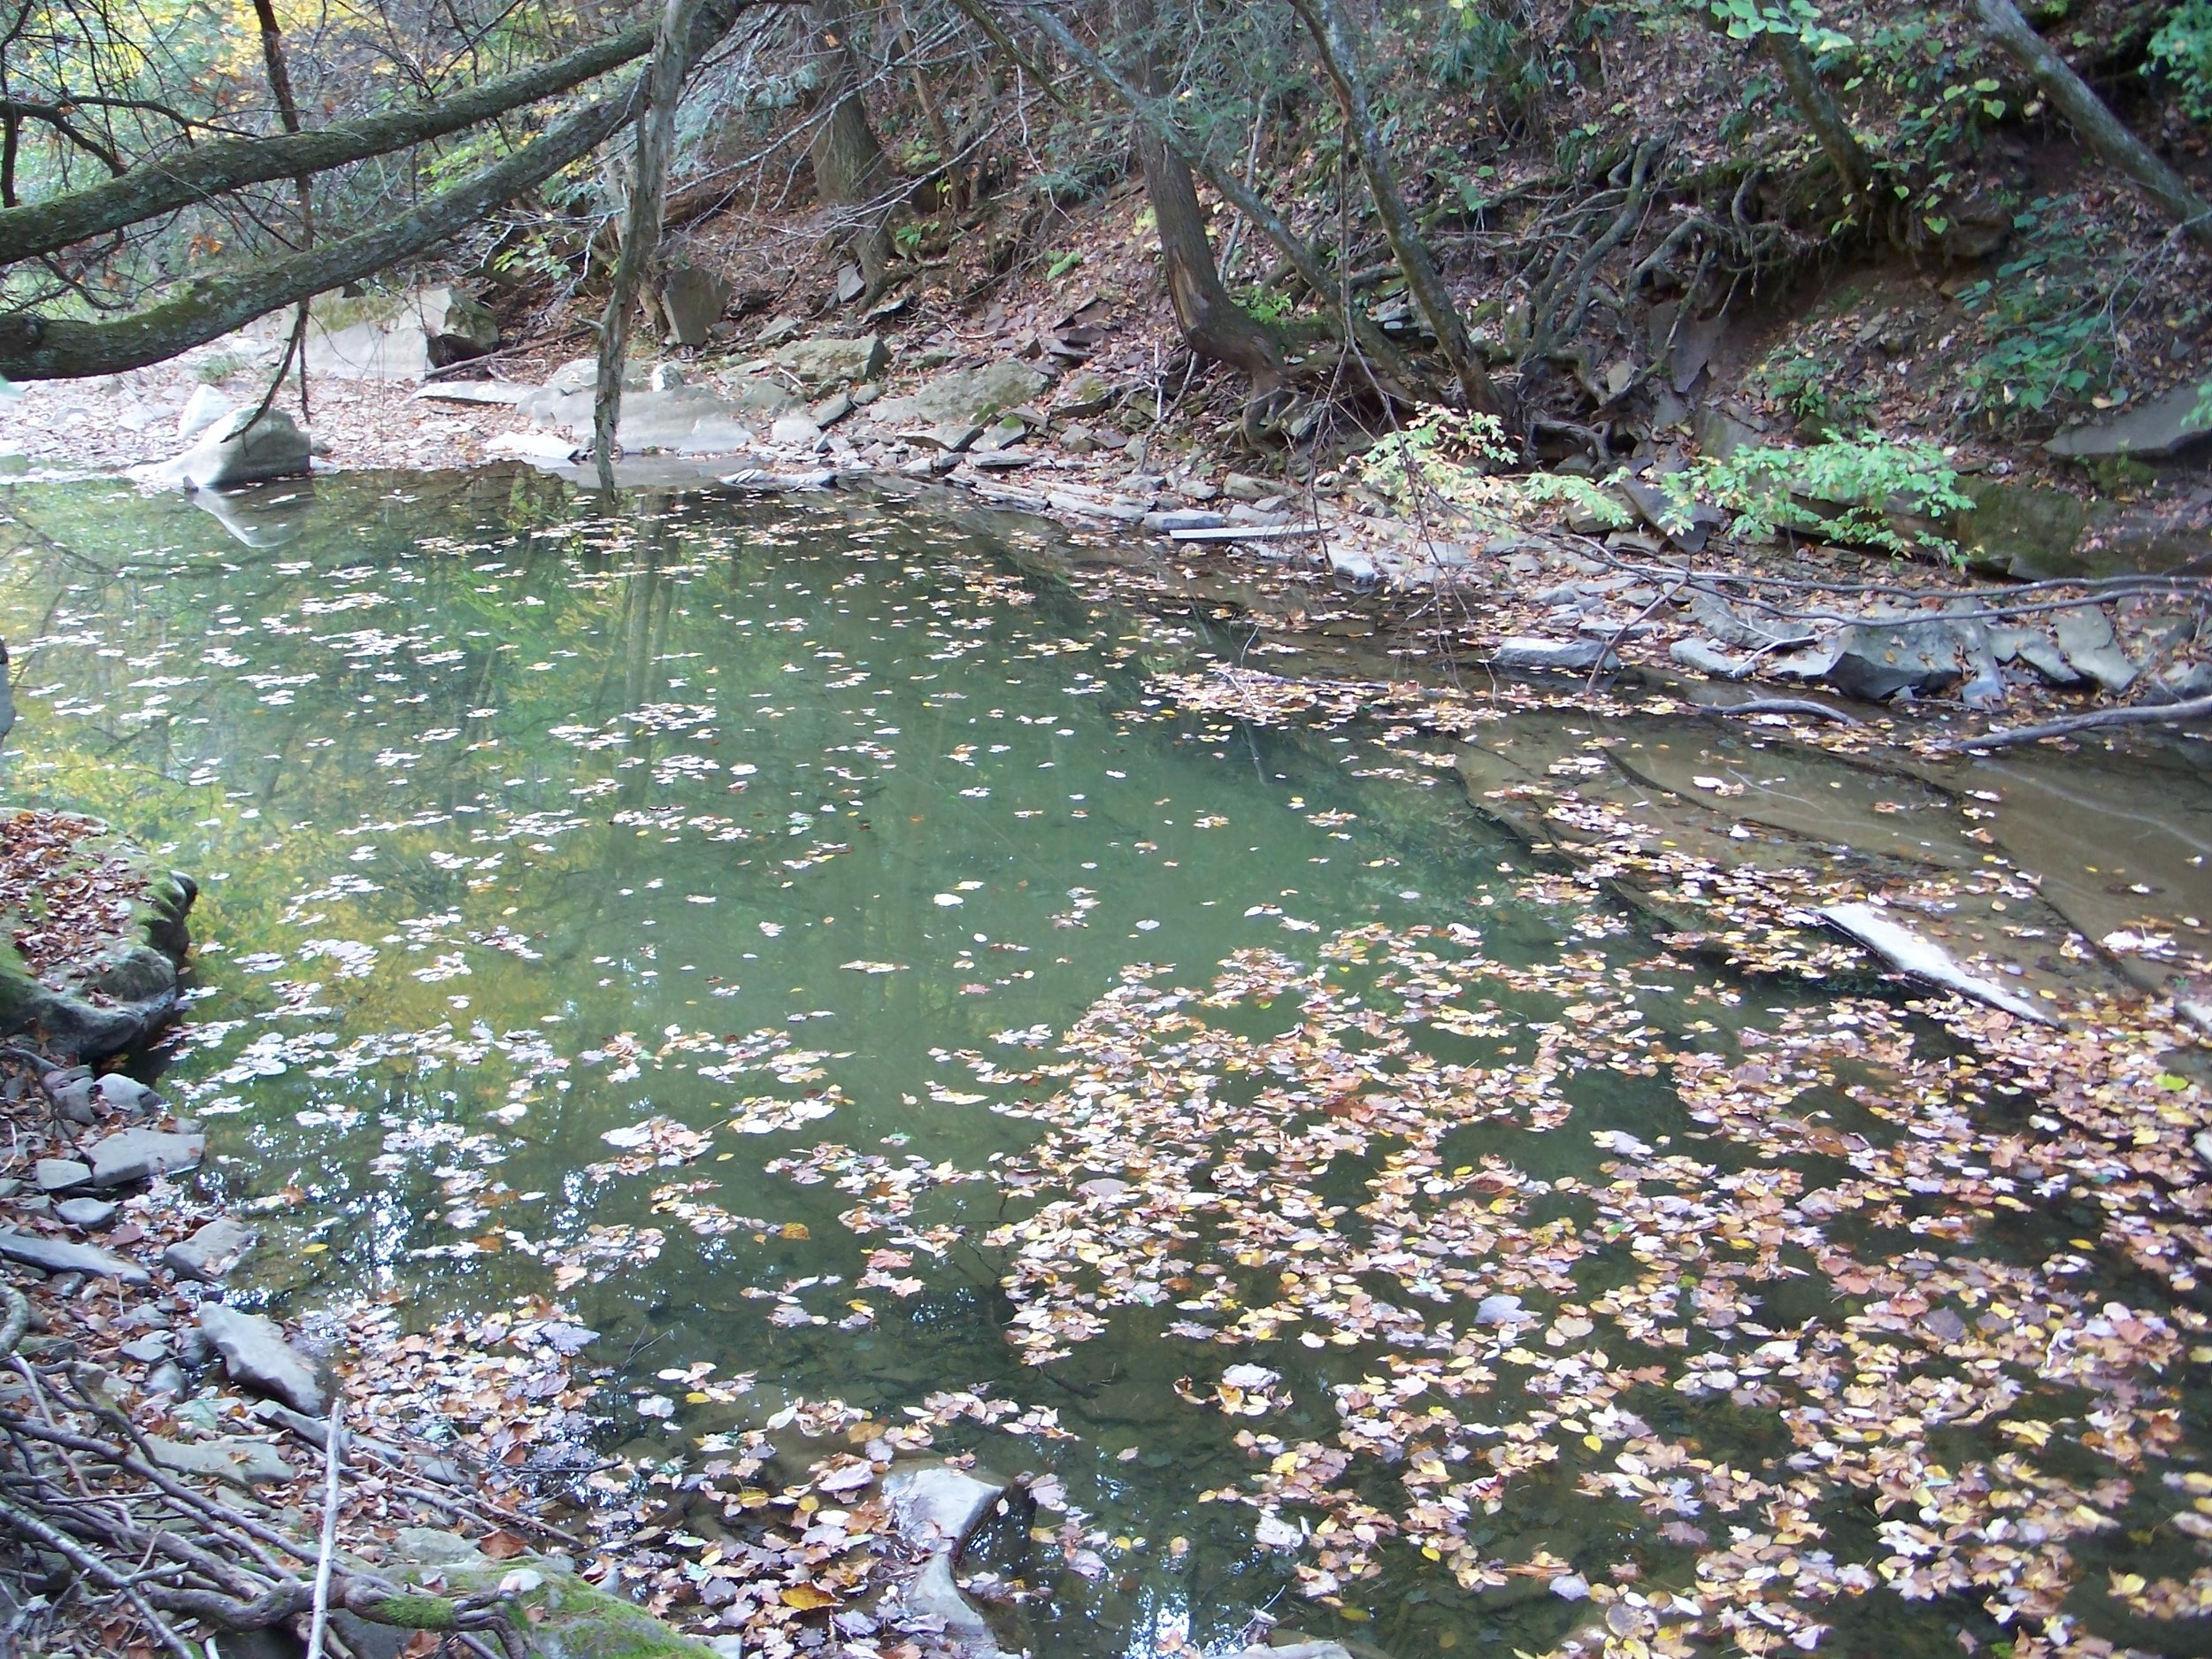 S3 Beaver Ck swimming hole - By Doug Wood